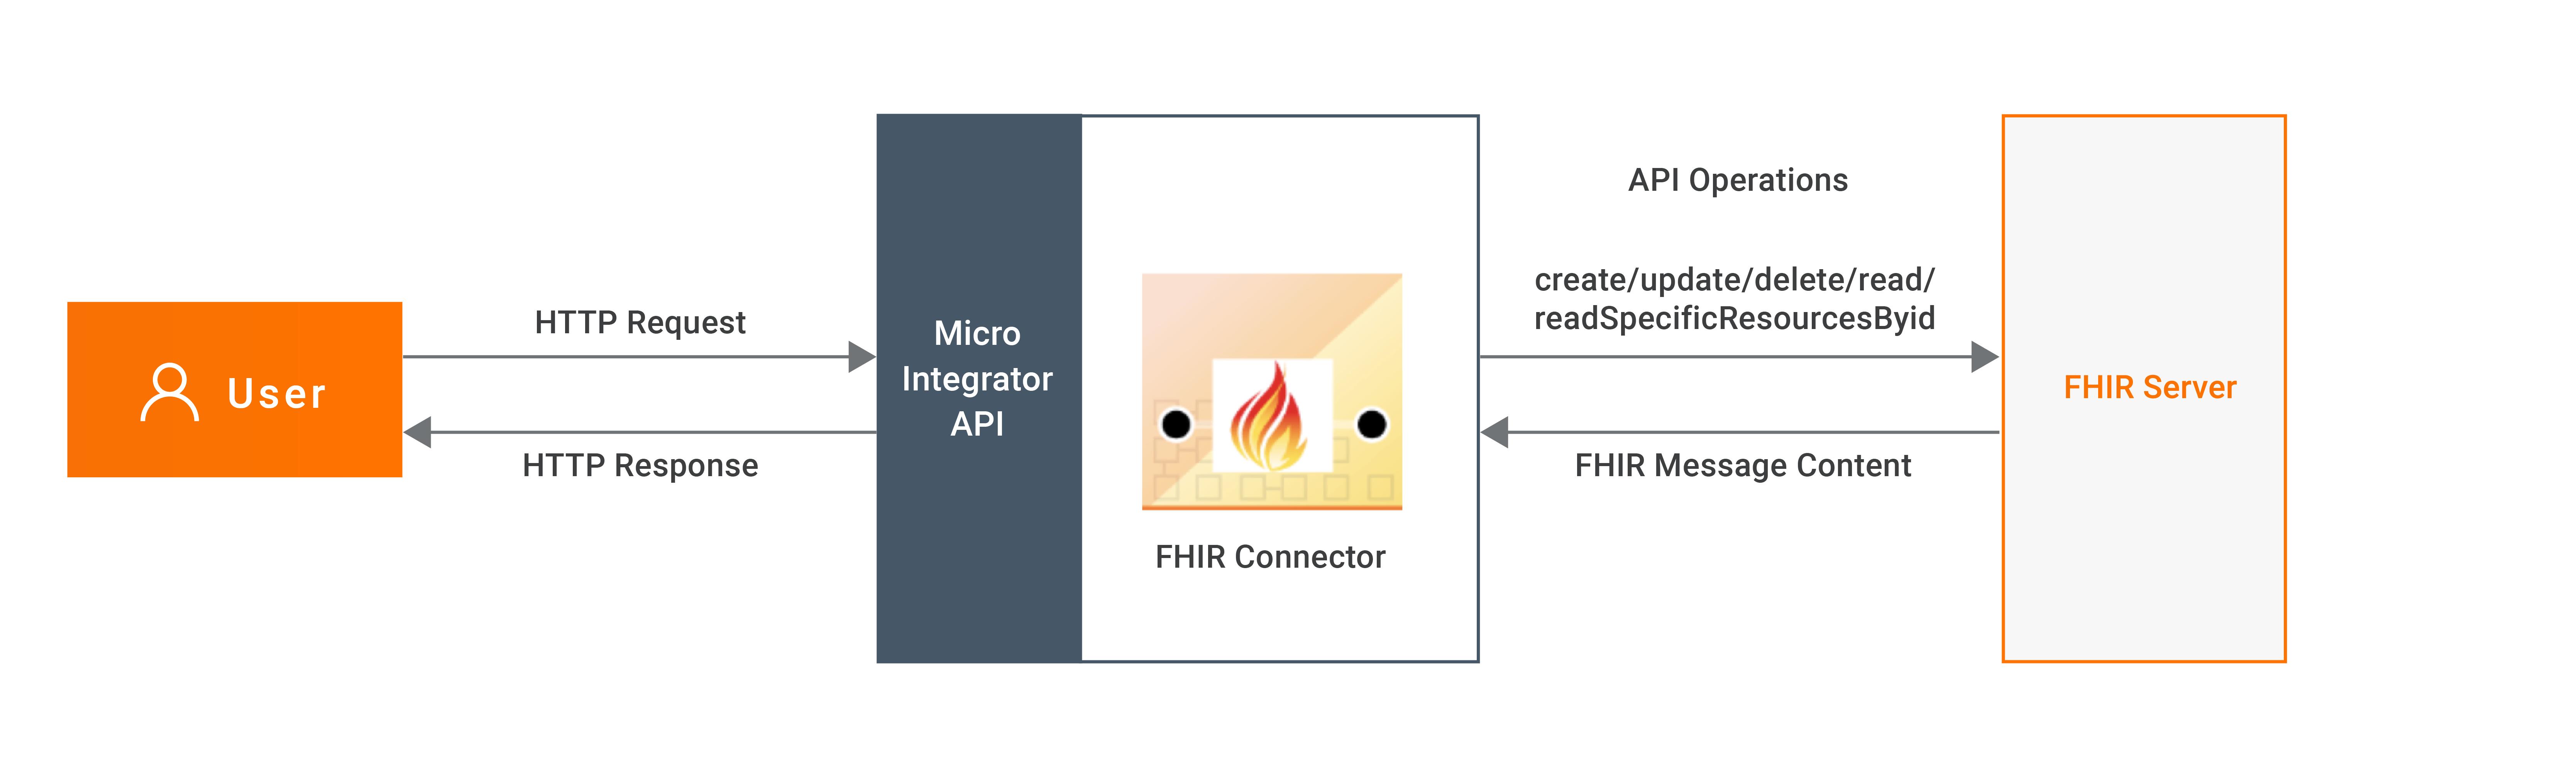 FHIR Connector